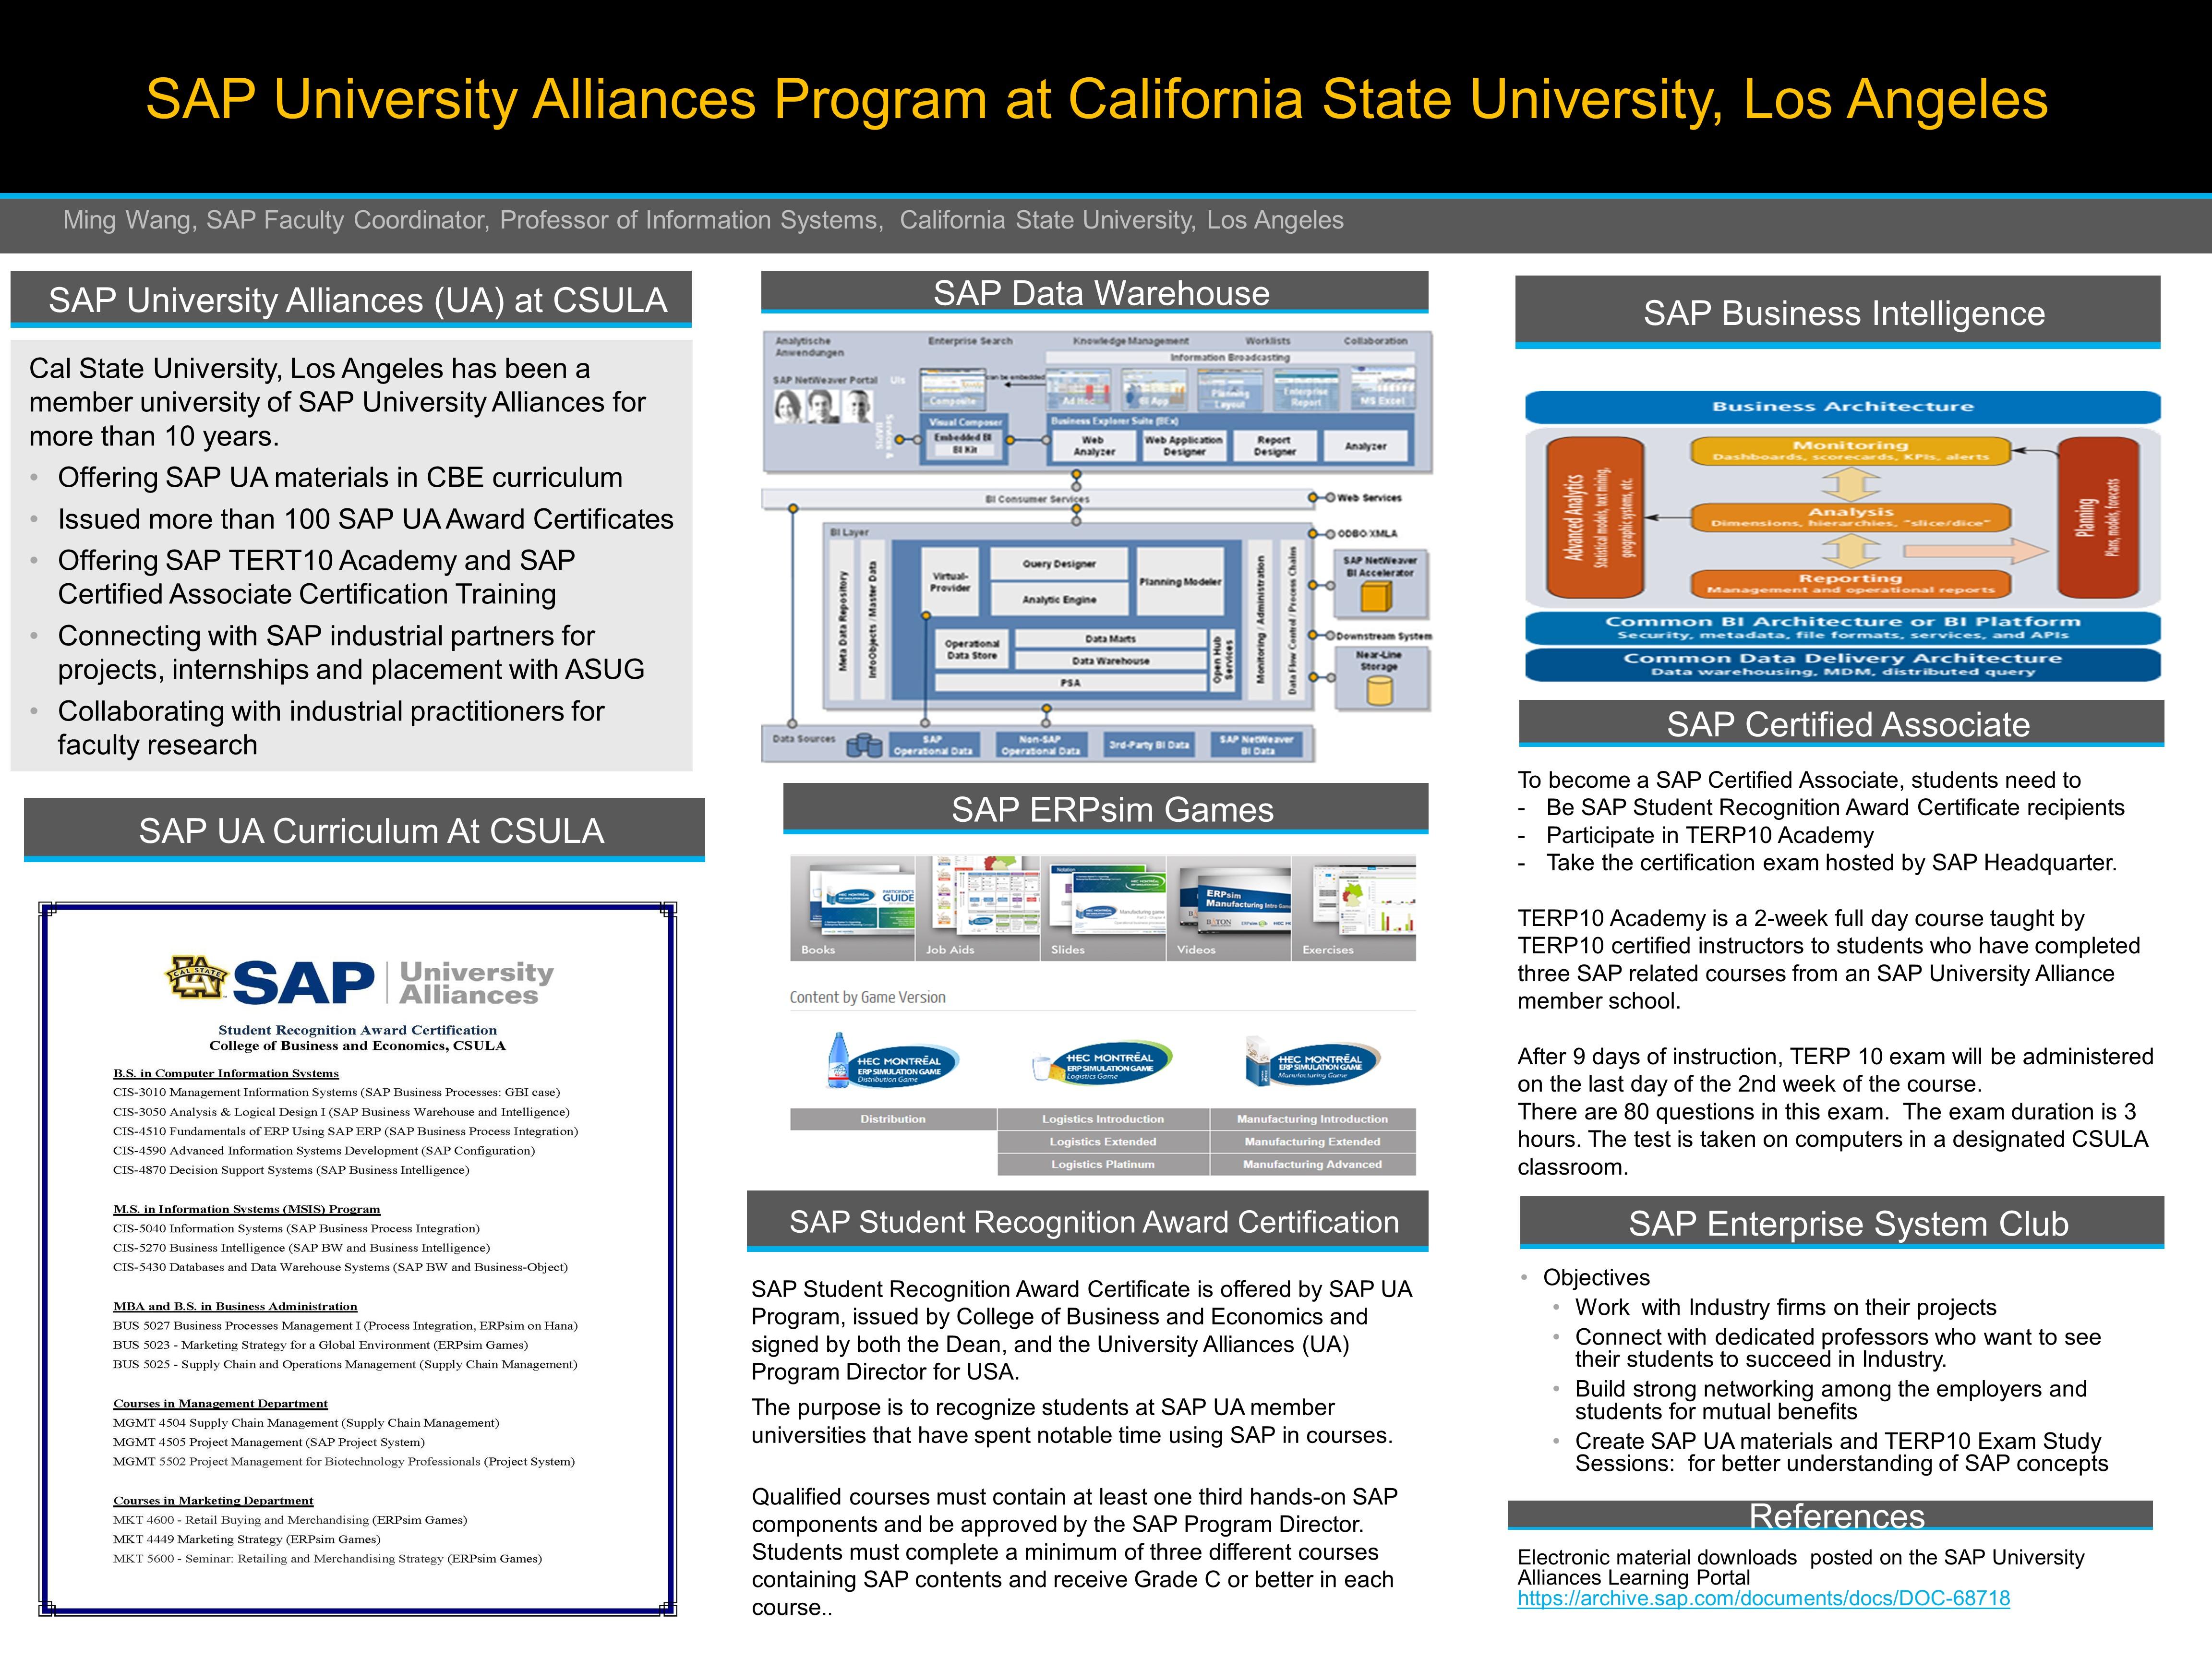 CSULA SAP Alliance